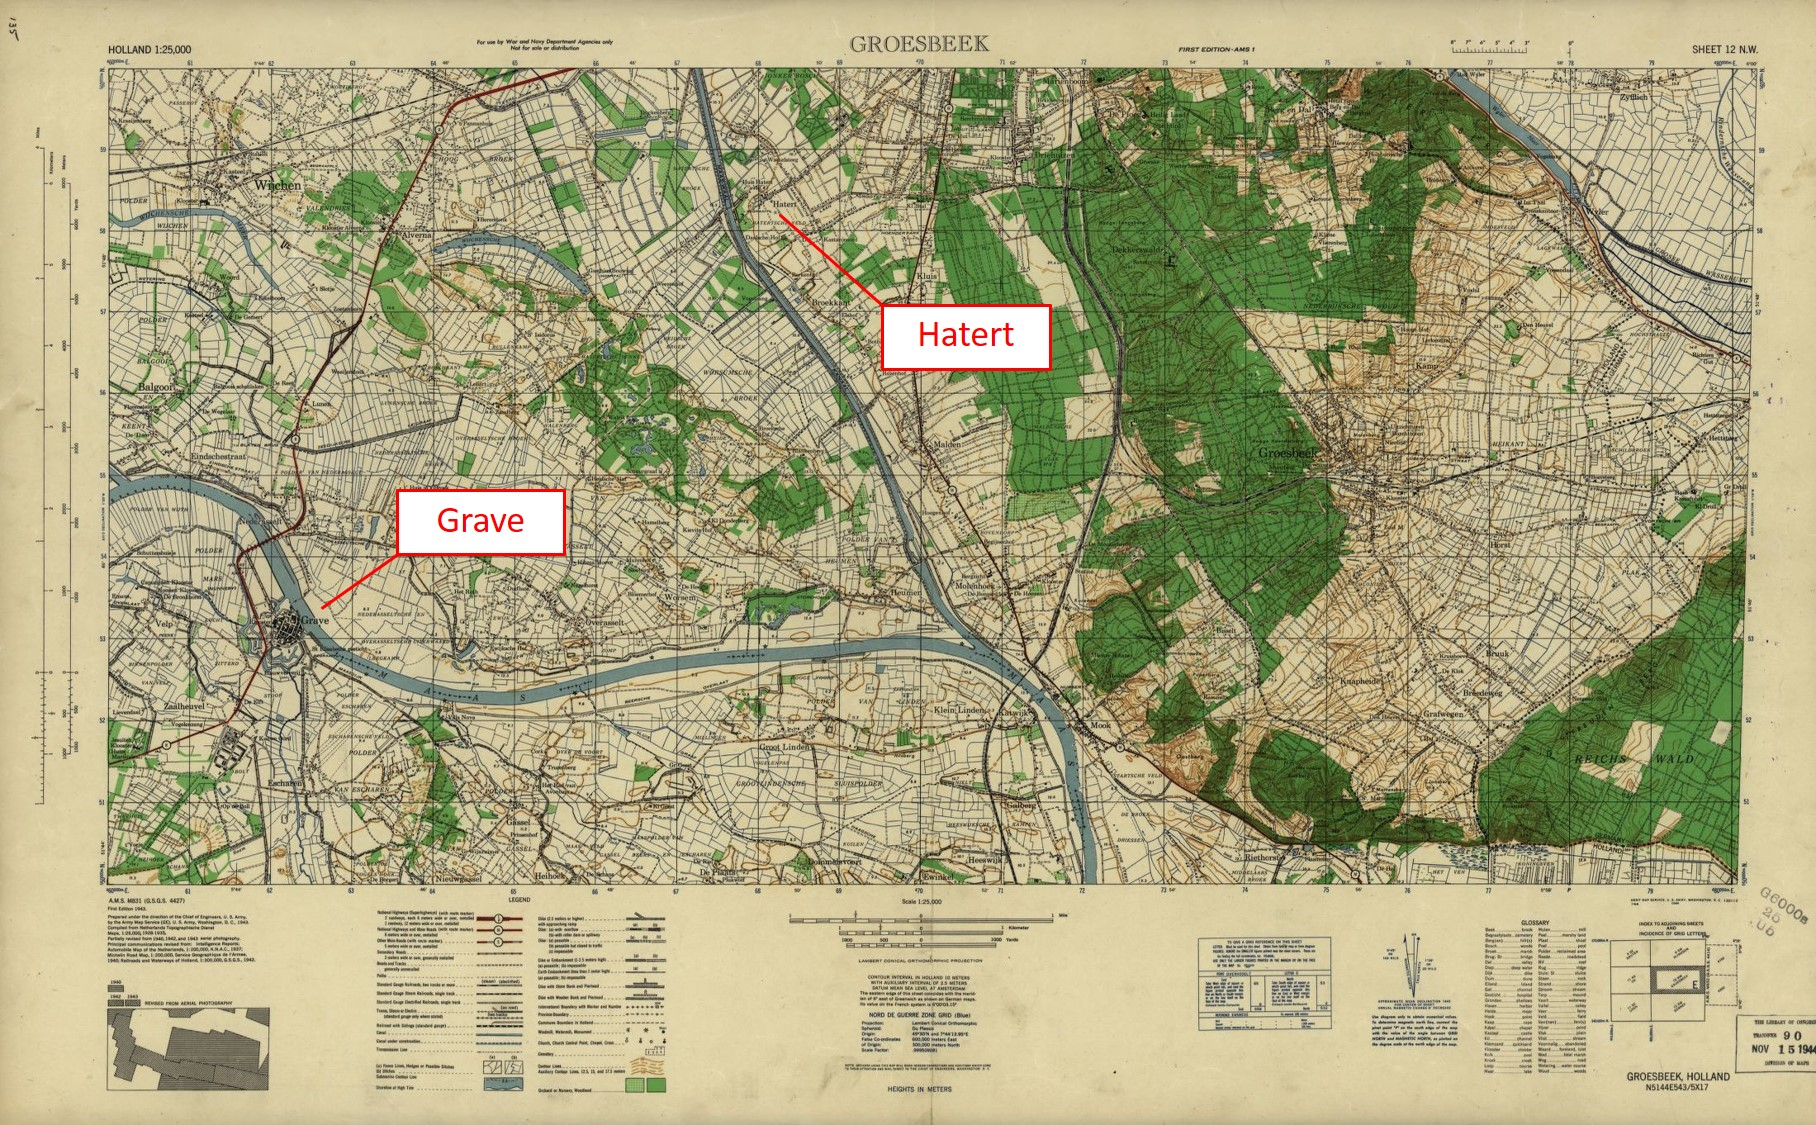 036A - GSGS-4427 -Groesbeek